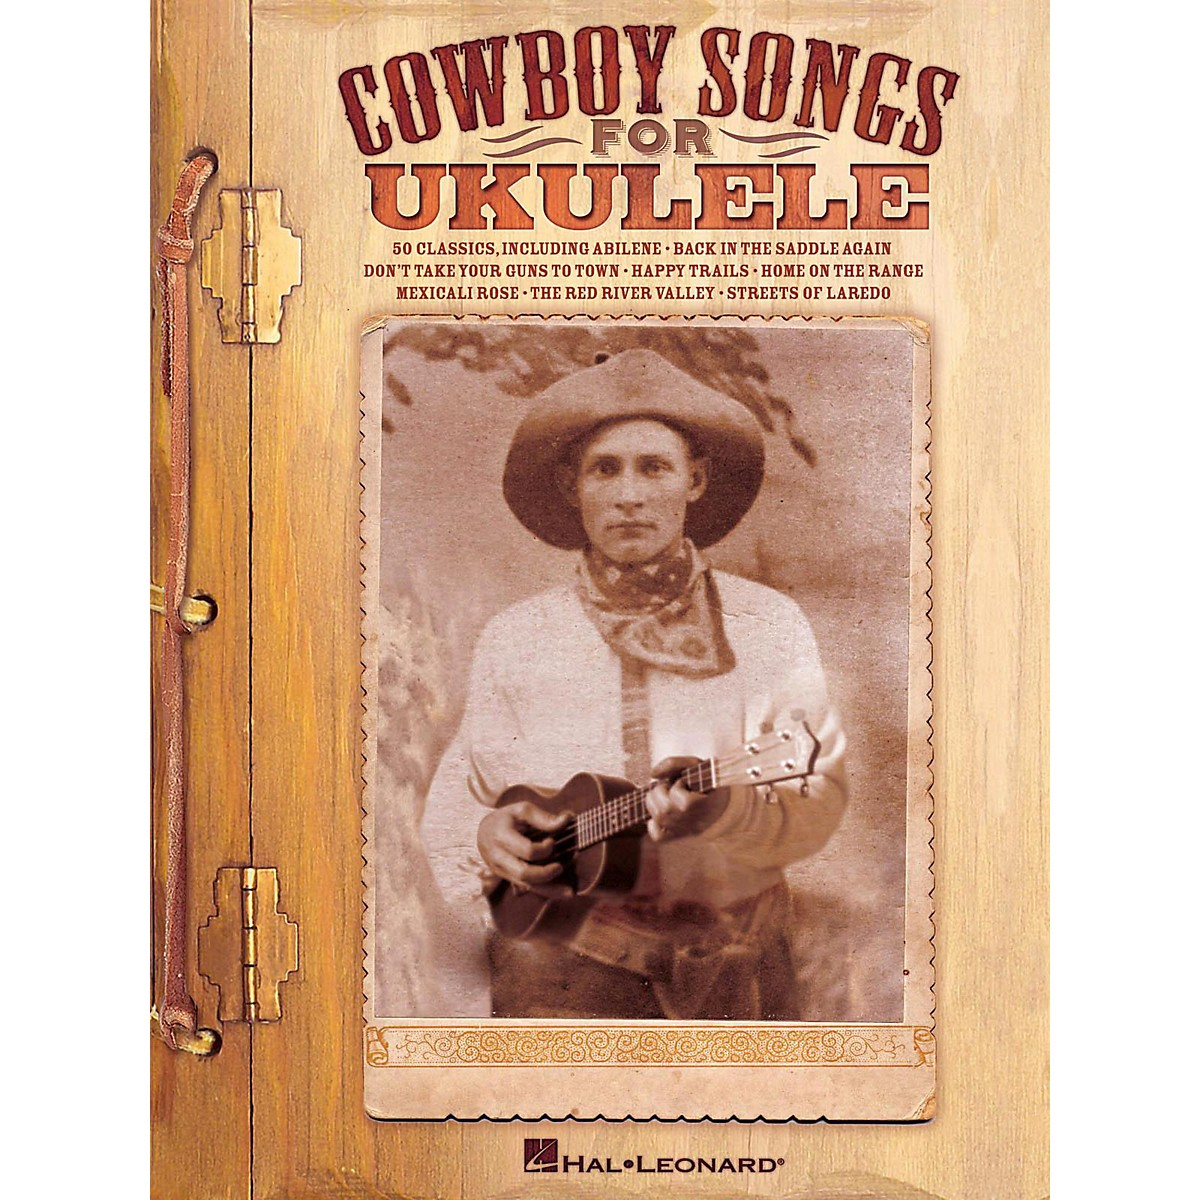 Hal Leonard Cowboy Songs For Ukulele